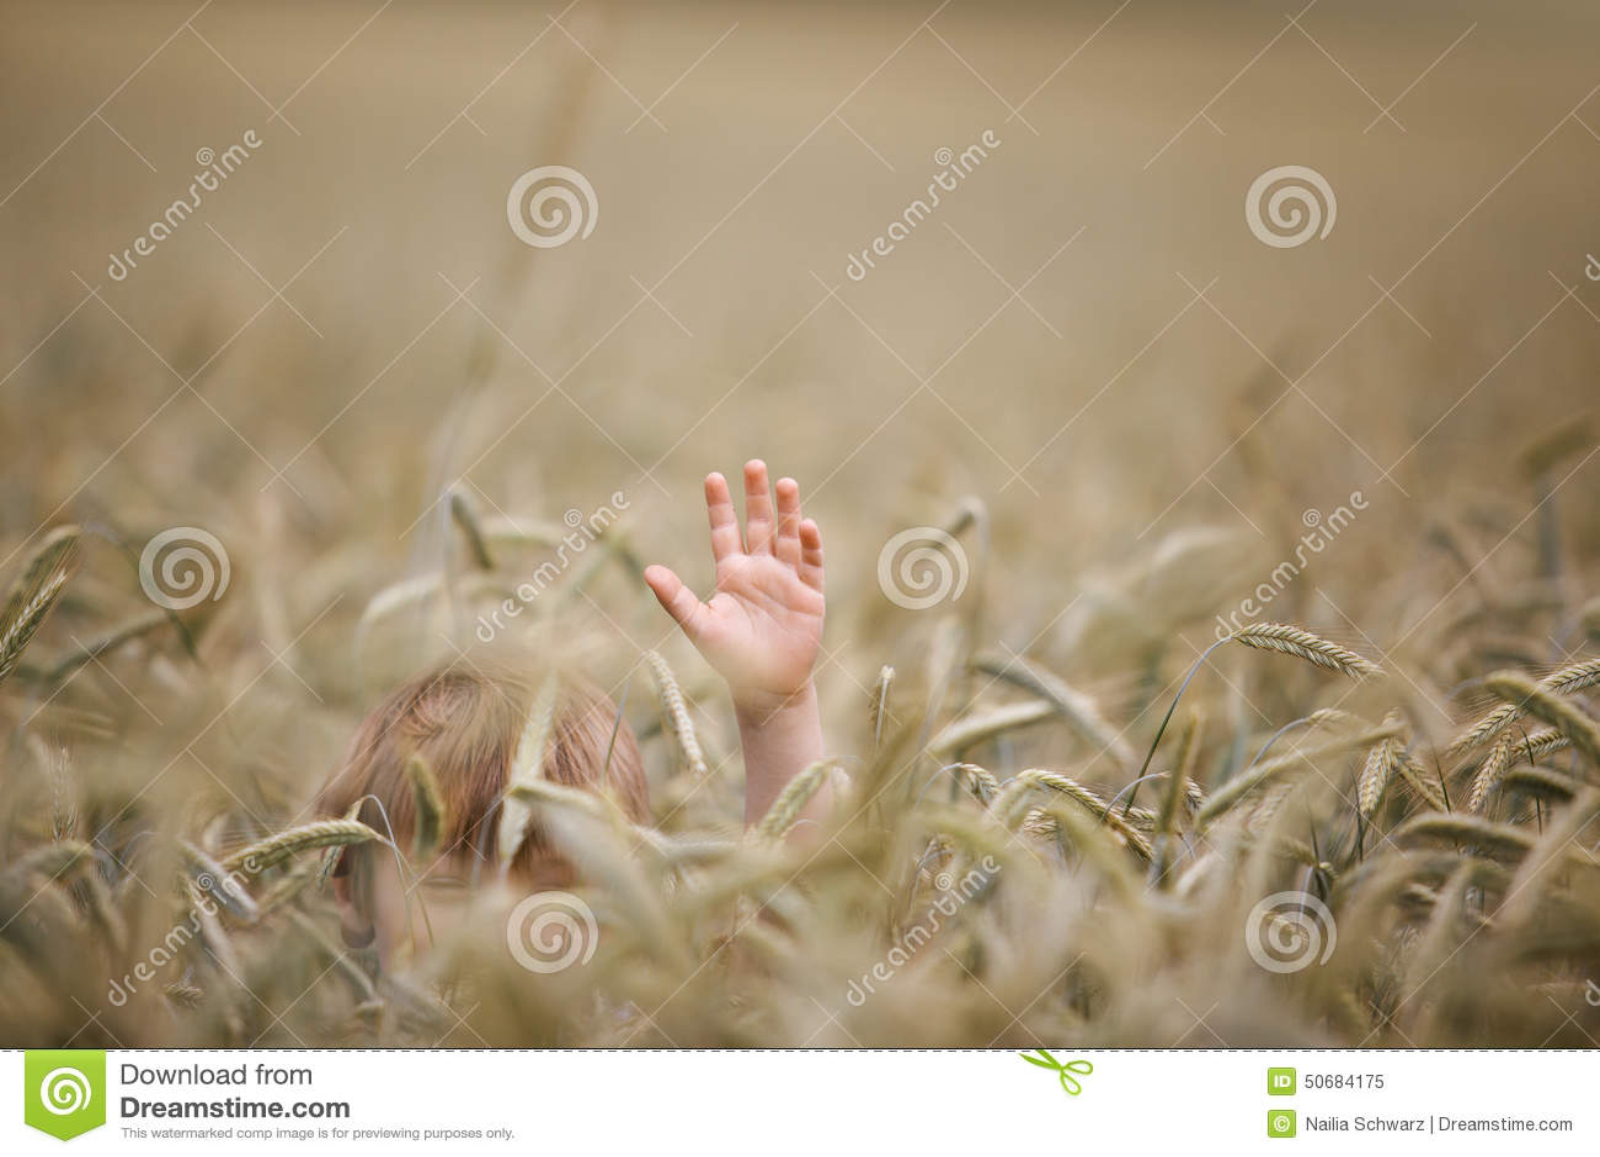 Download 麦田的男孩 库存图片. 图片 包括有 现有量, 挥动, 夏天, 金黄, 成熟, browne, ,并且, 男朋友 - 50684175